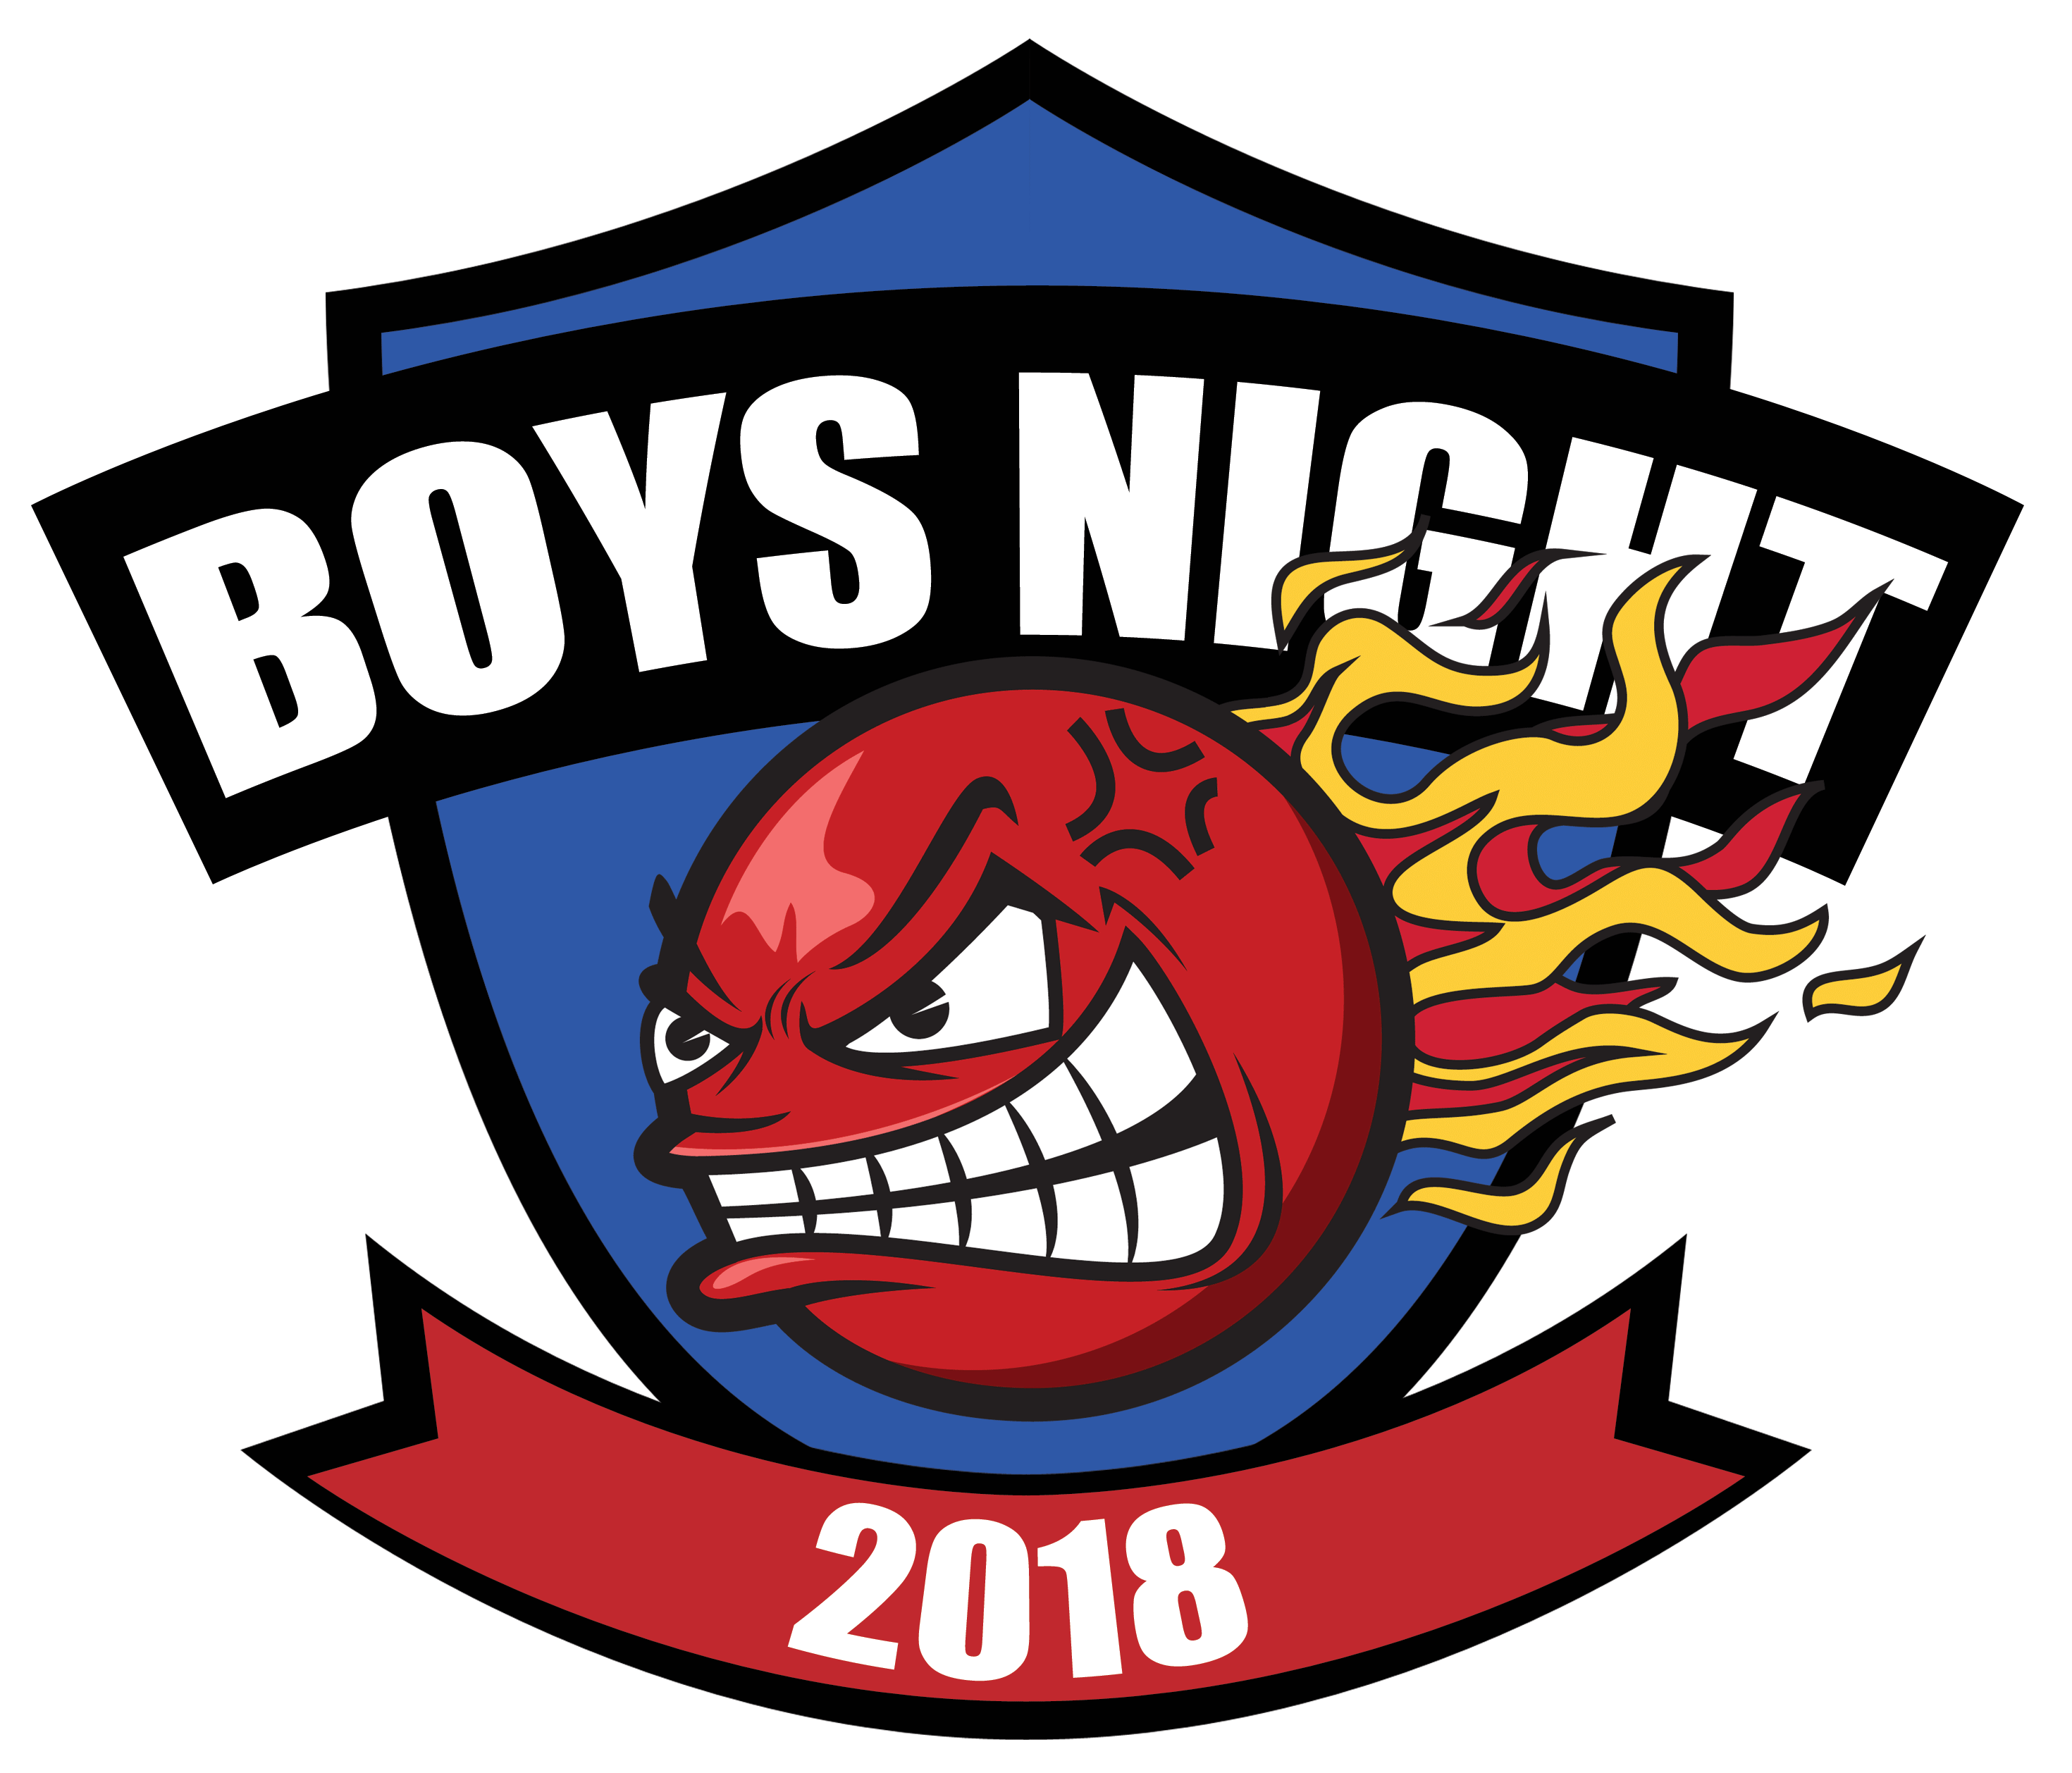 Boysnight2018logo2